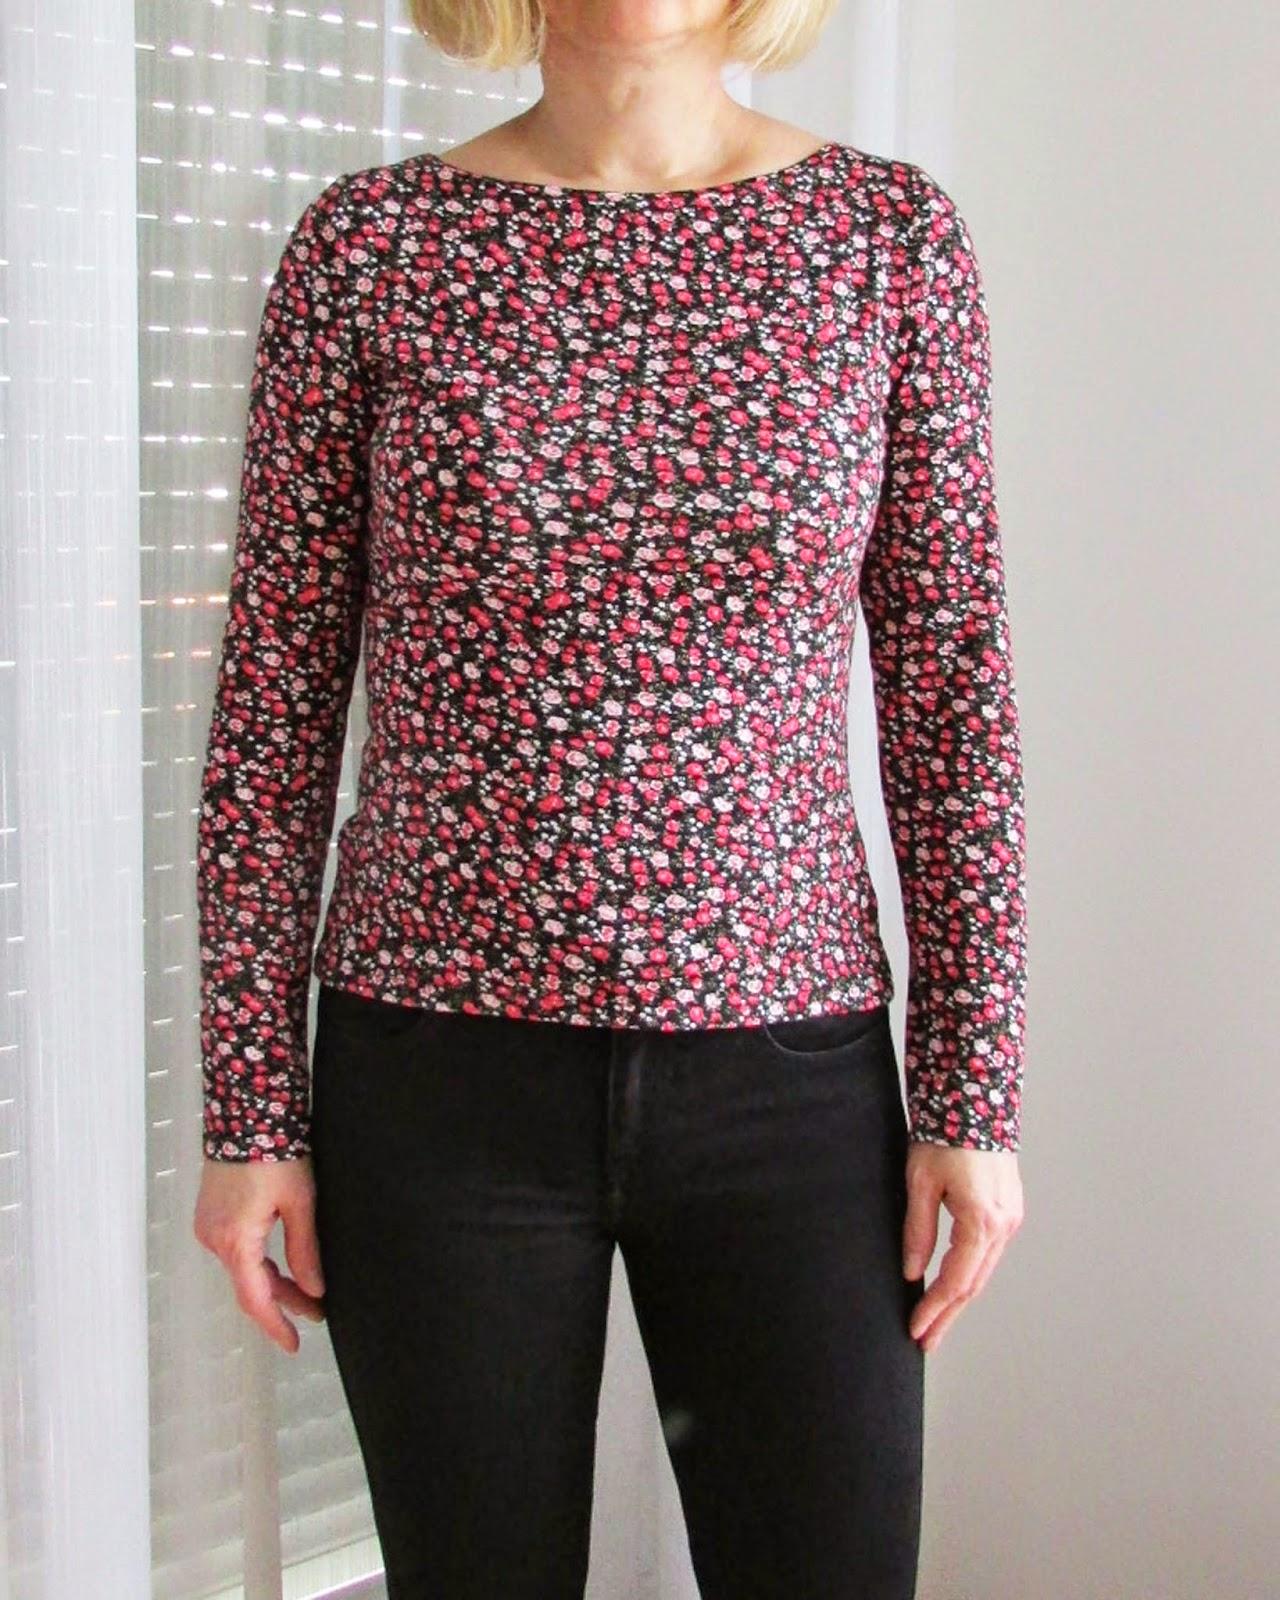 http://ladylinaland.blogspot.com/2014/05/floral-t-shirt-top.html